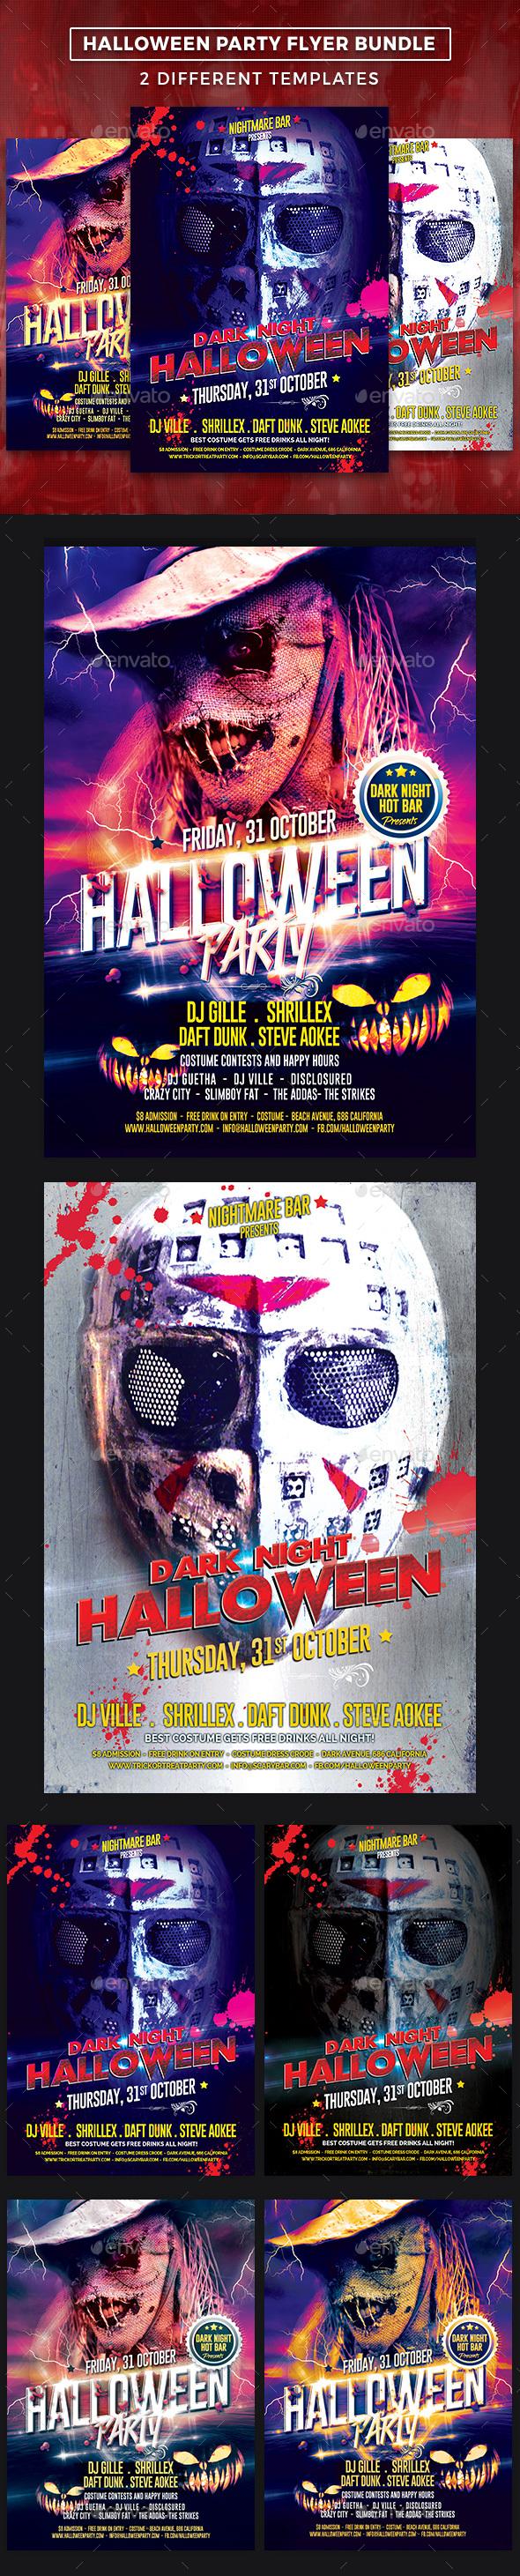 Halloween Party Flyer Template Bundle